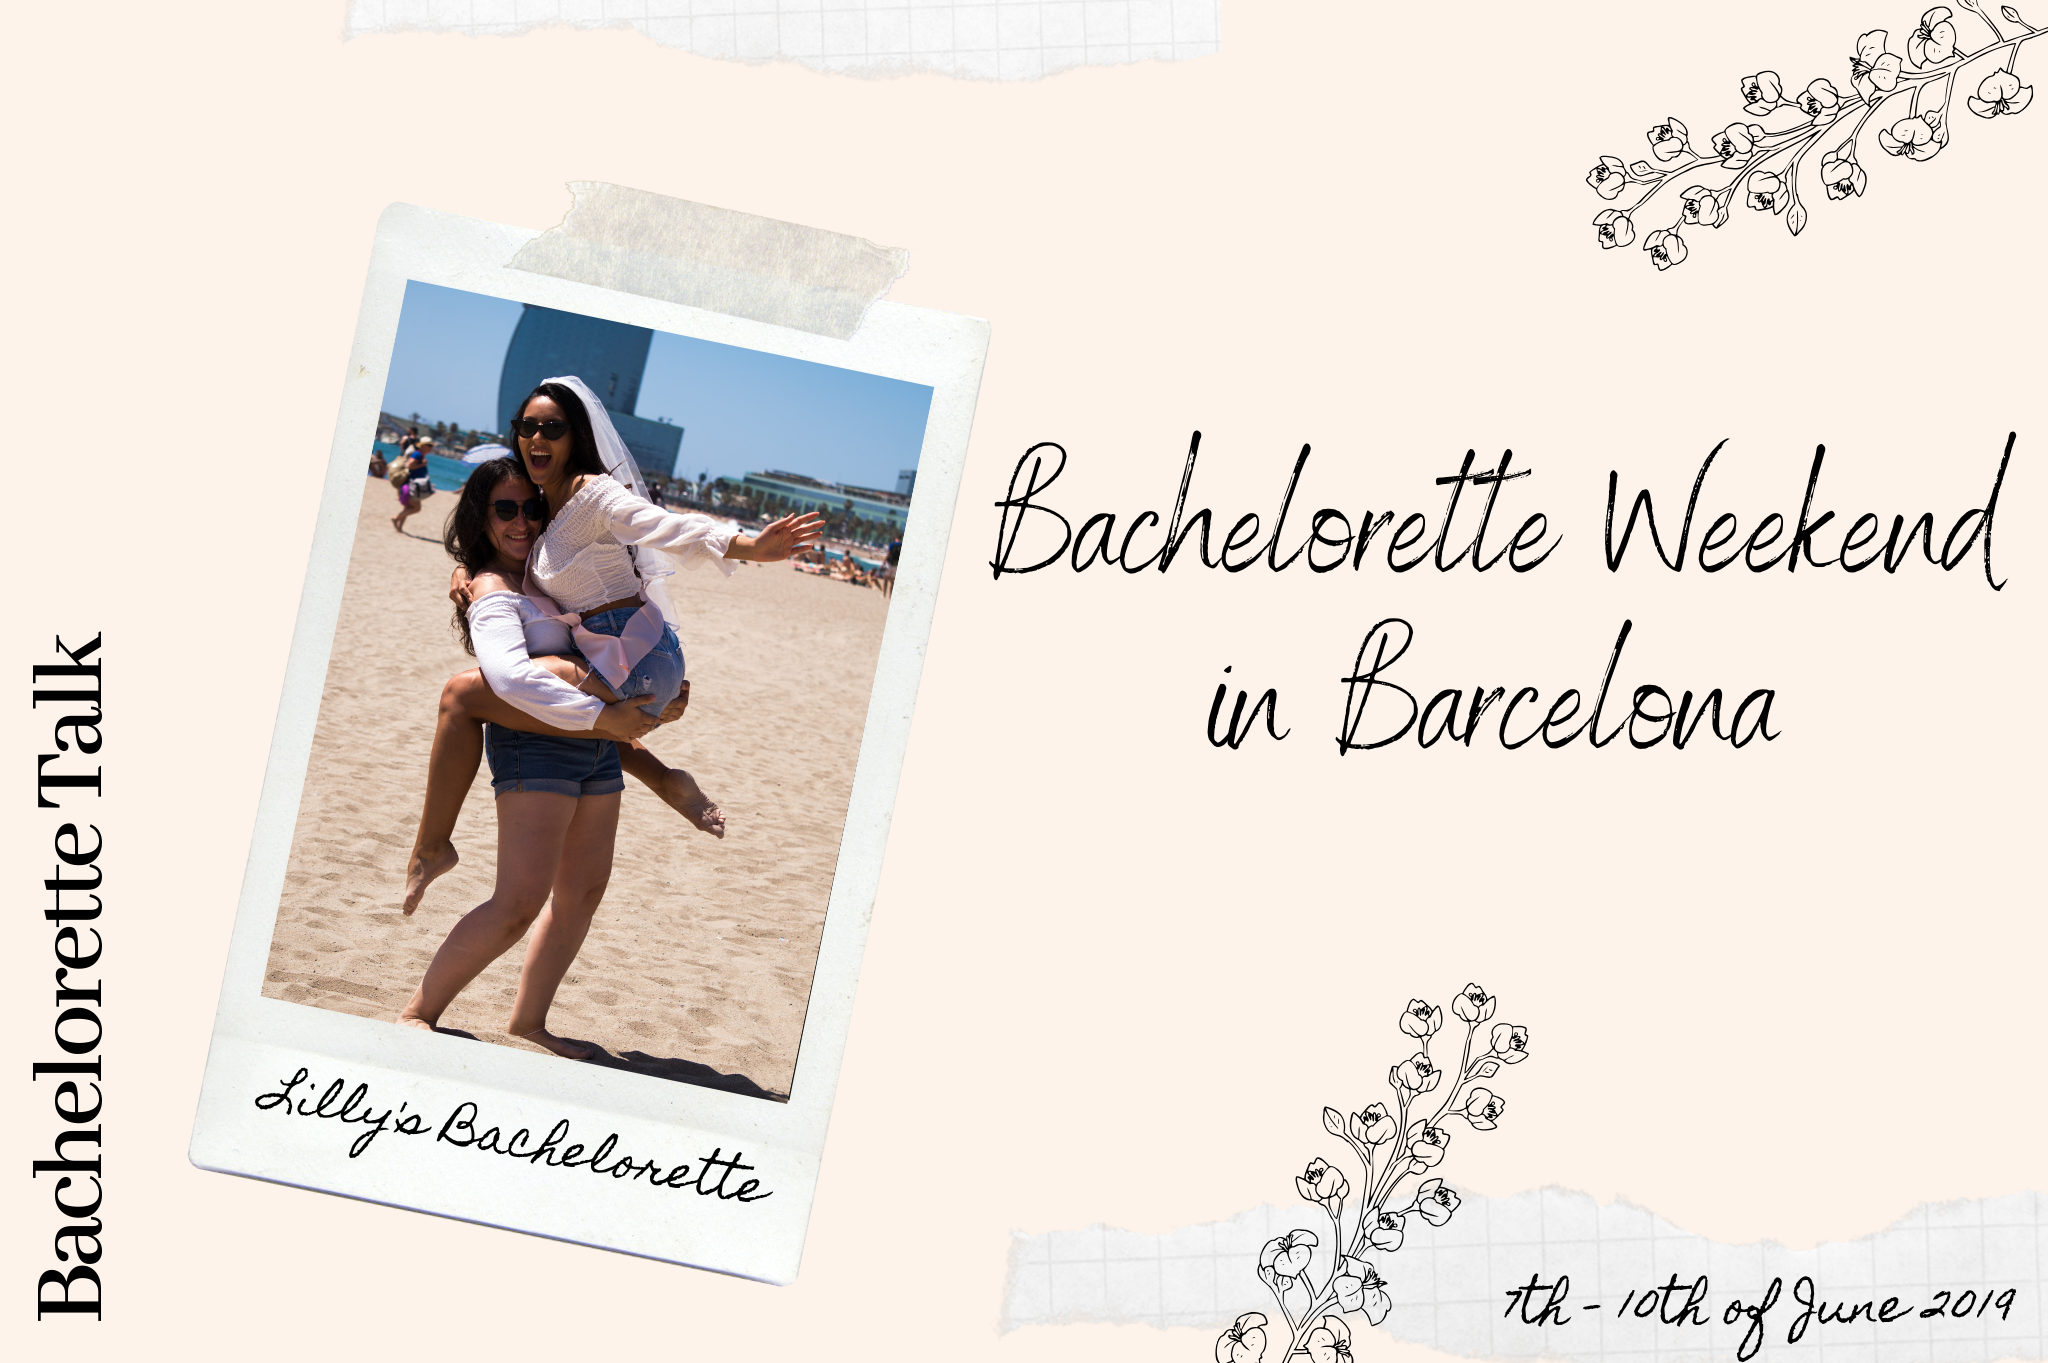 lillys bachelorette weekend in barcelona bride to be in spain bachelorette decor party weekend barcelona